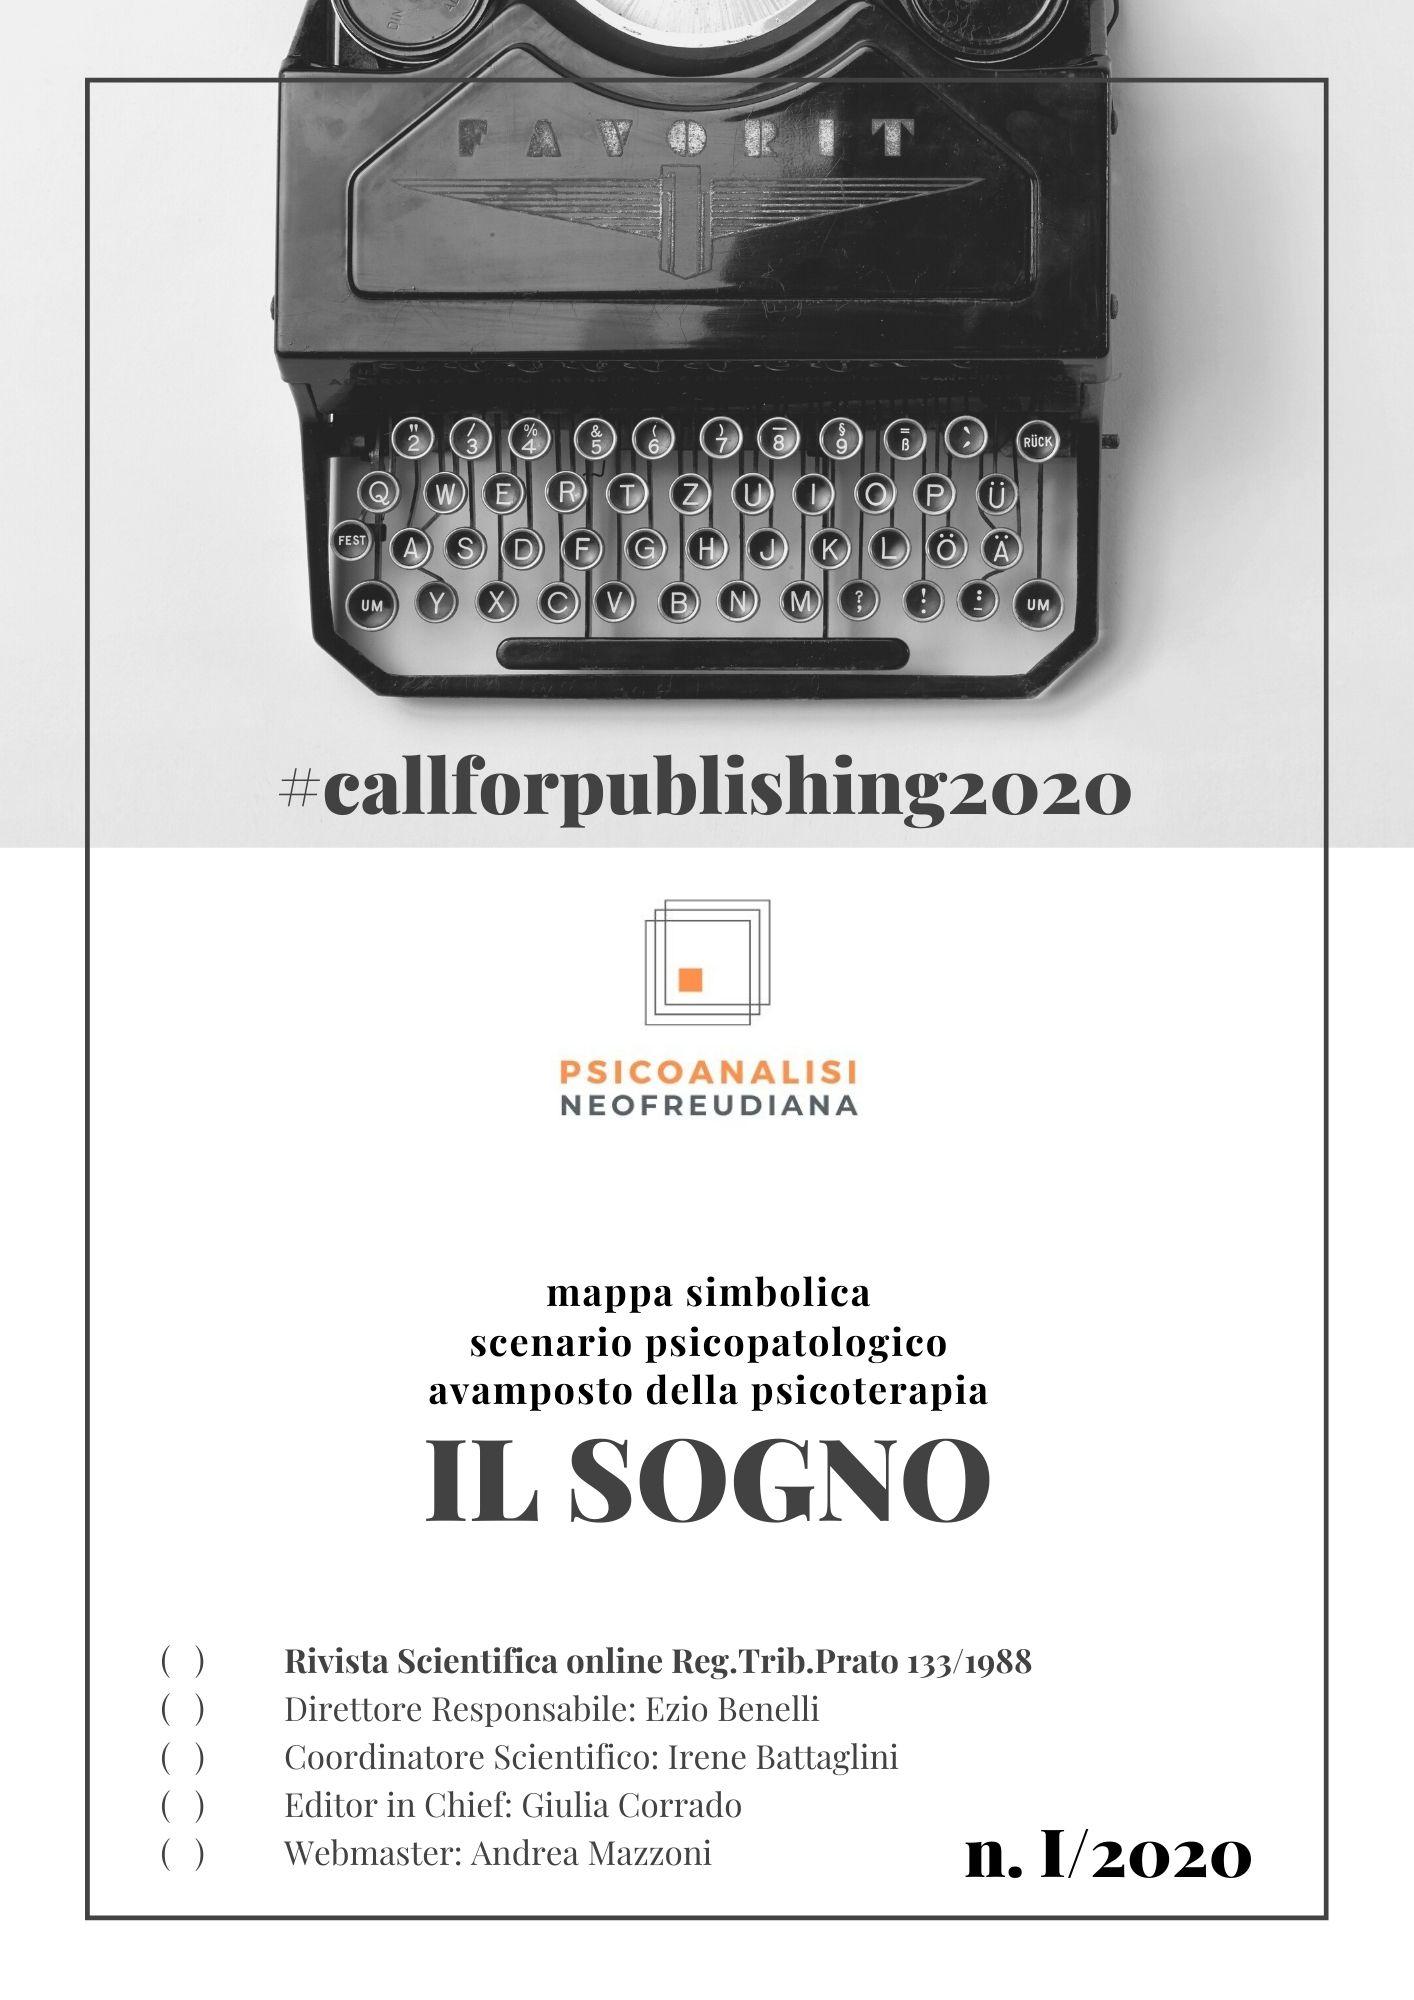 N 1.2020 PSICOANALISI NEOFREUDIANA CALL FOR PUBLISHING